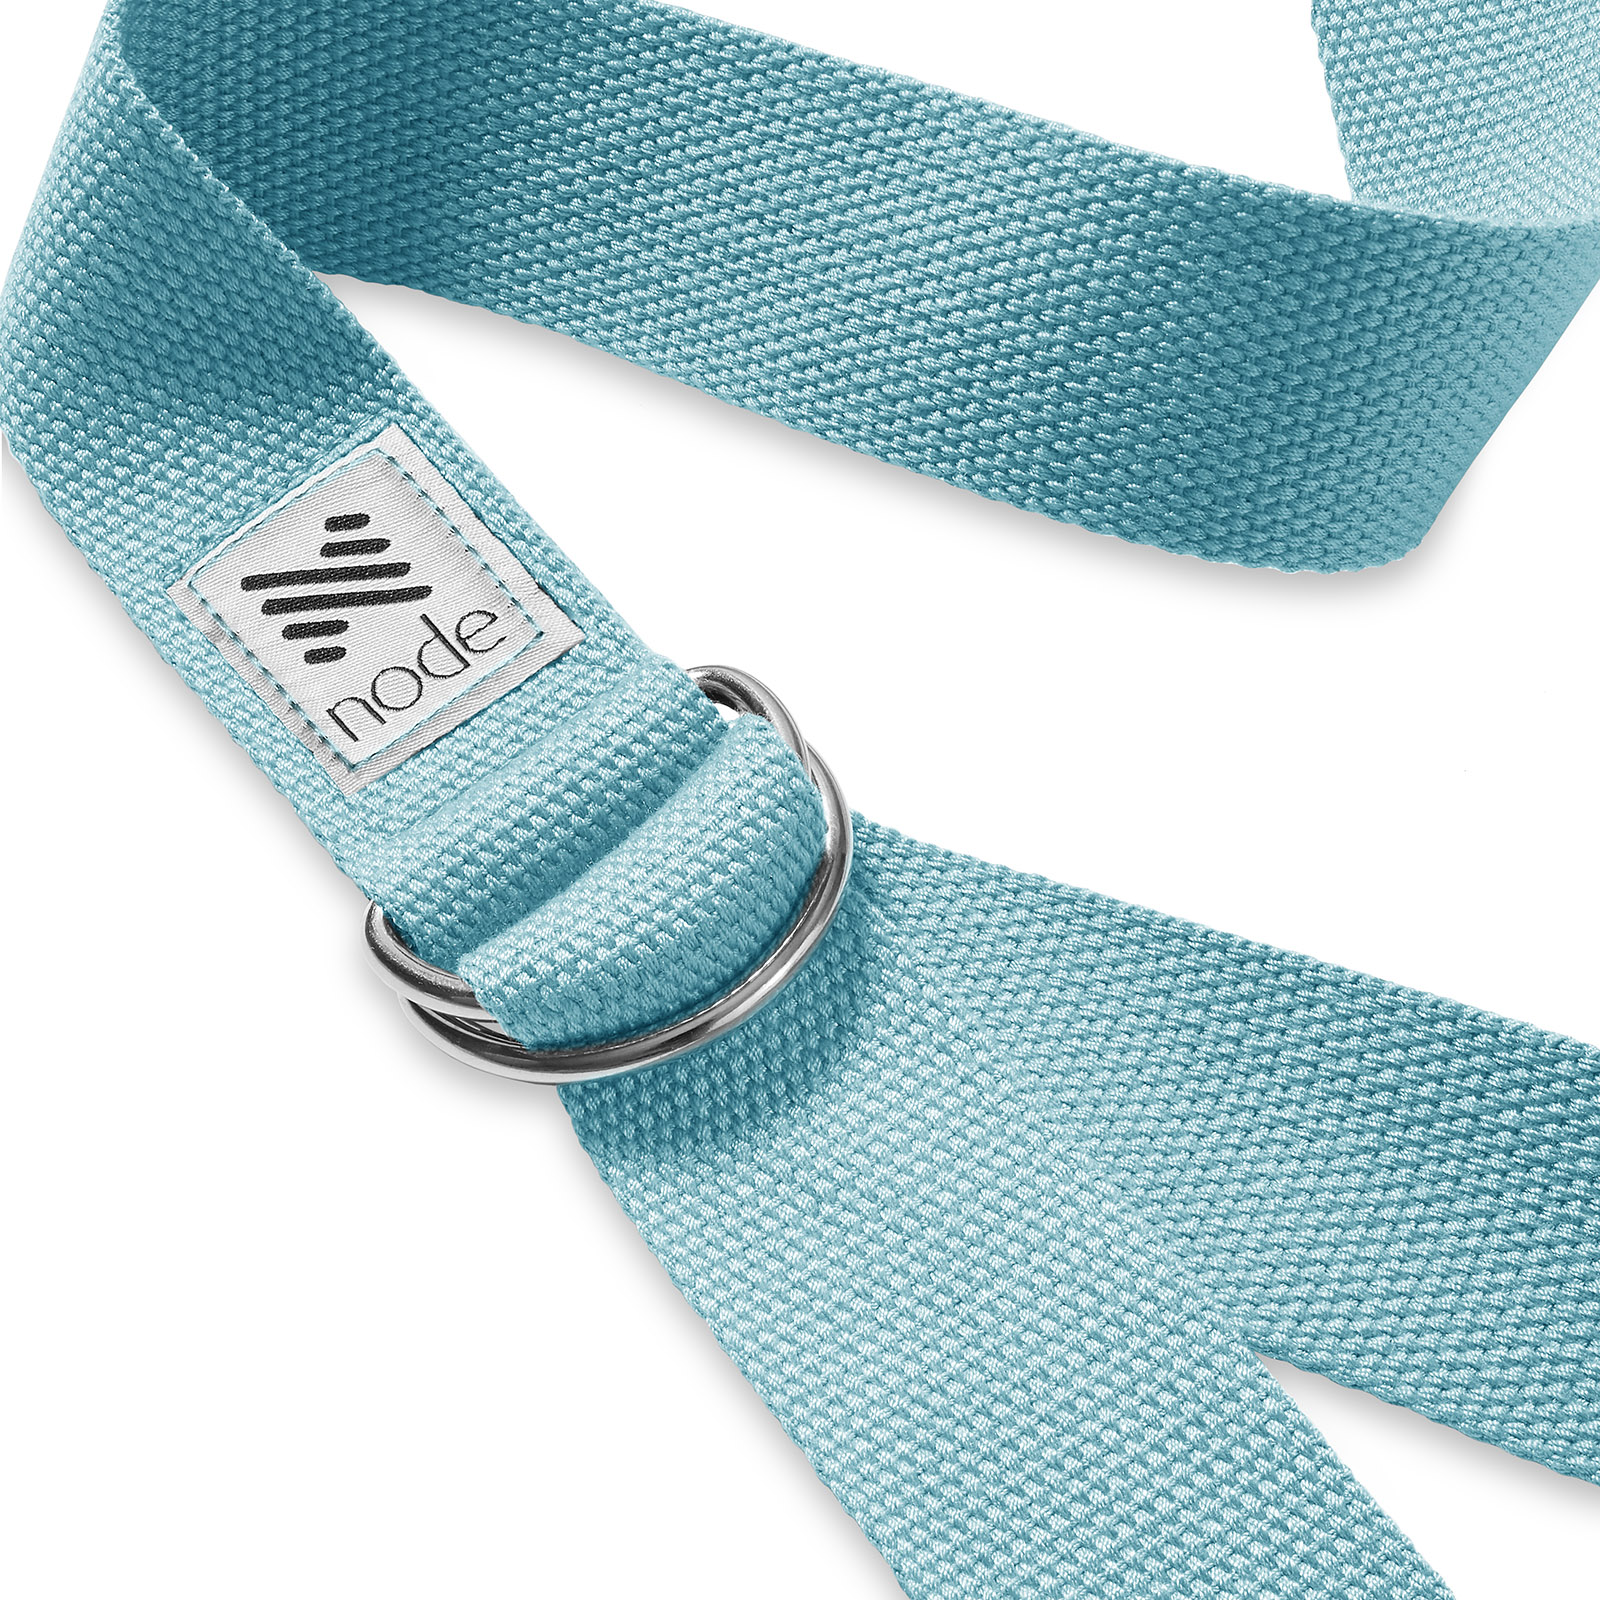 7-1-2-039-Woven-Cotton-Blend-Yoga-Strap-Stretching-Exercise-Prop-Belt thumbnail 40